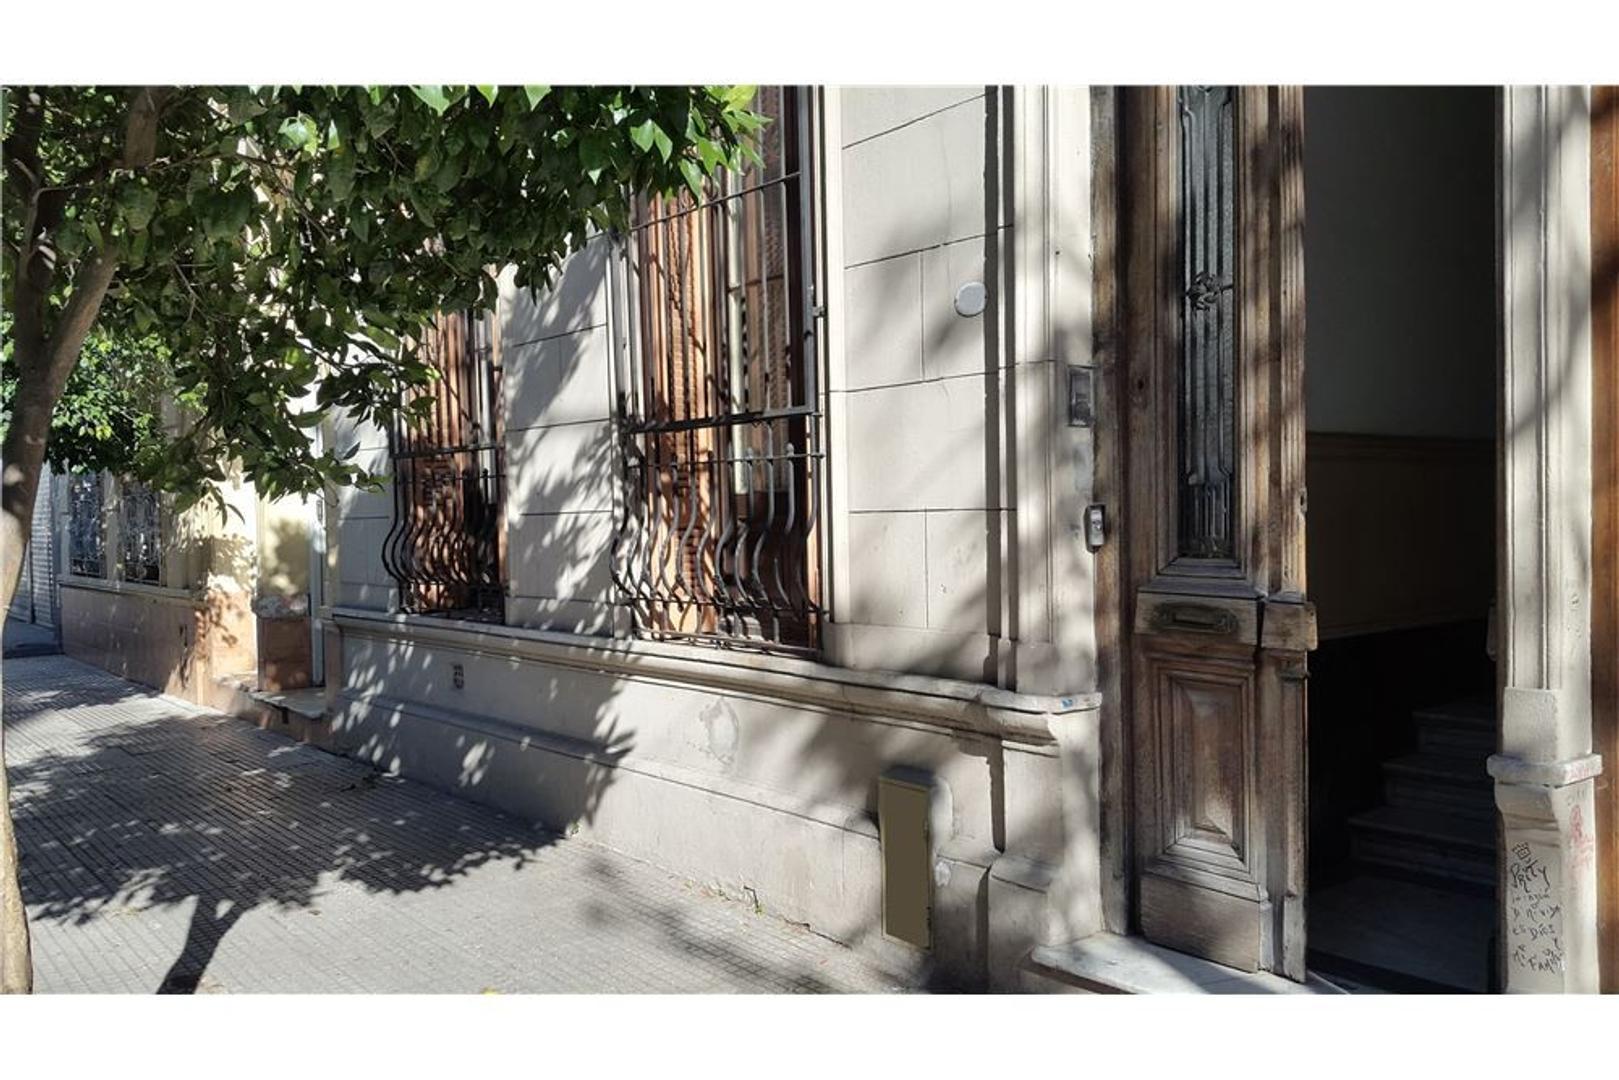 VENTA- PH PB° 5 amb (114 m2)+Entrepisos -BALVANERA